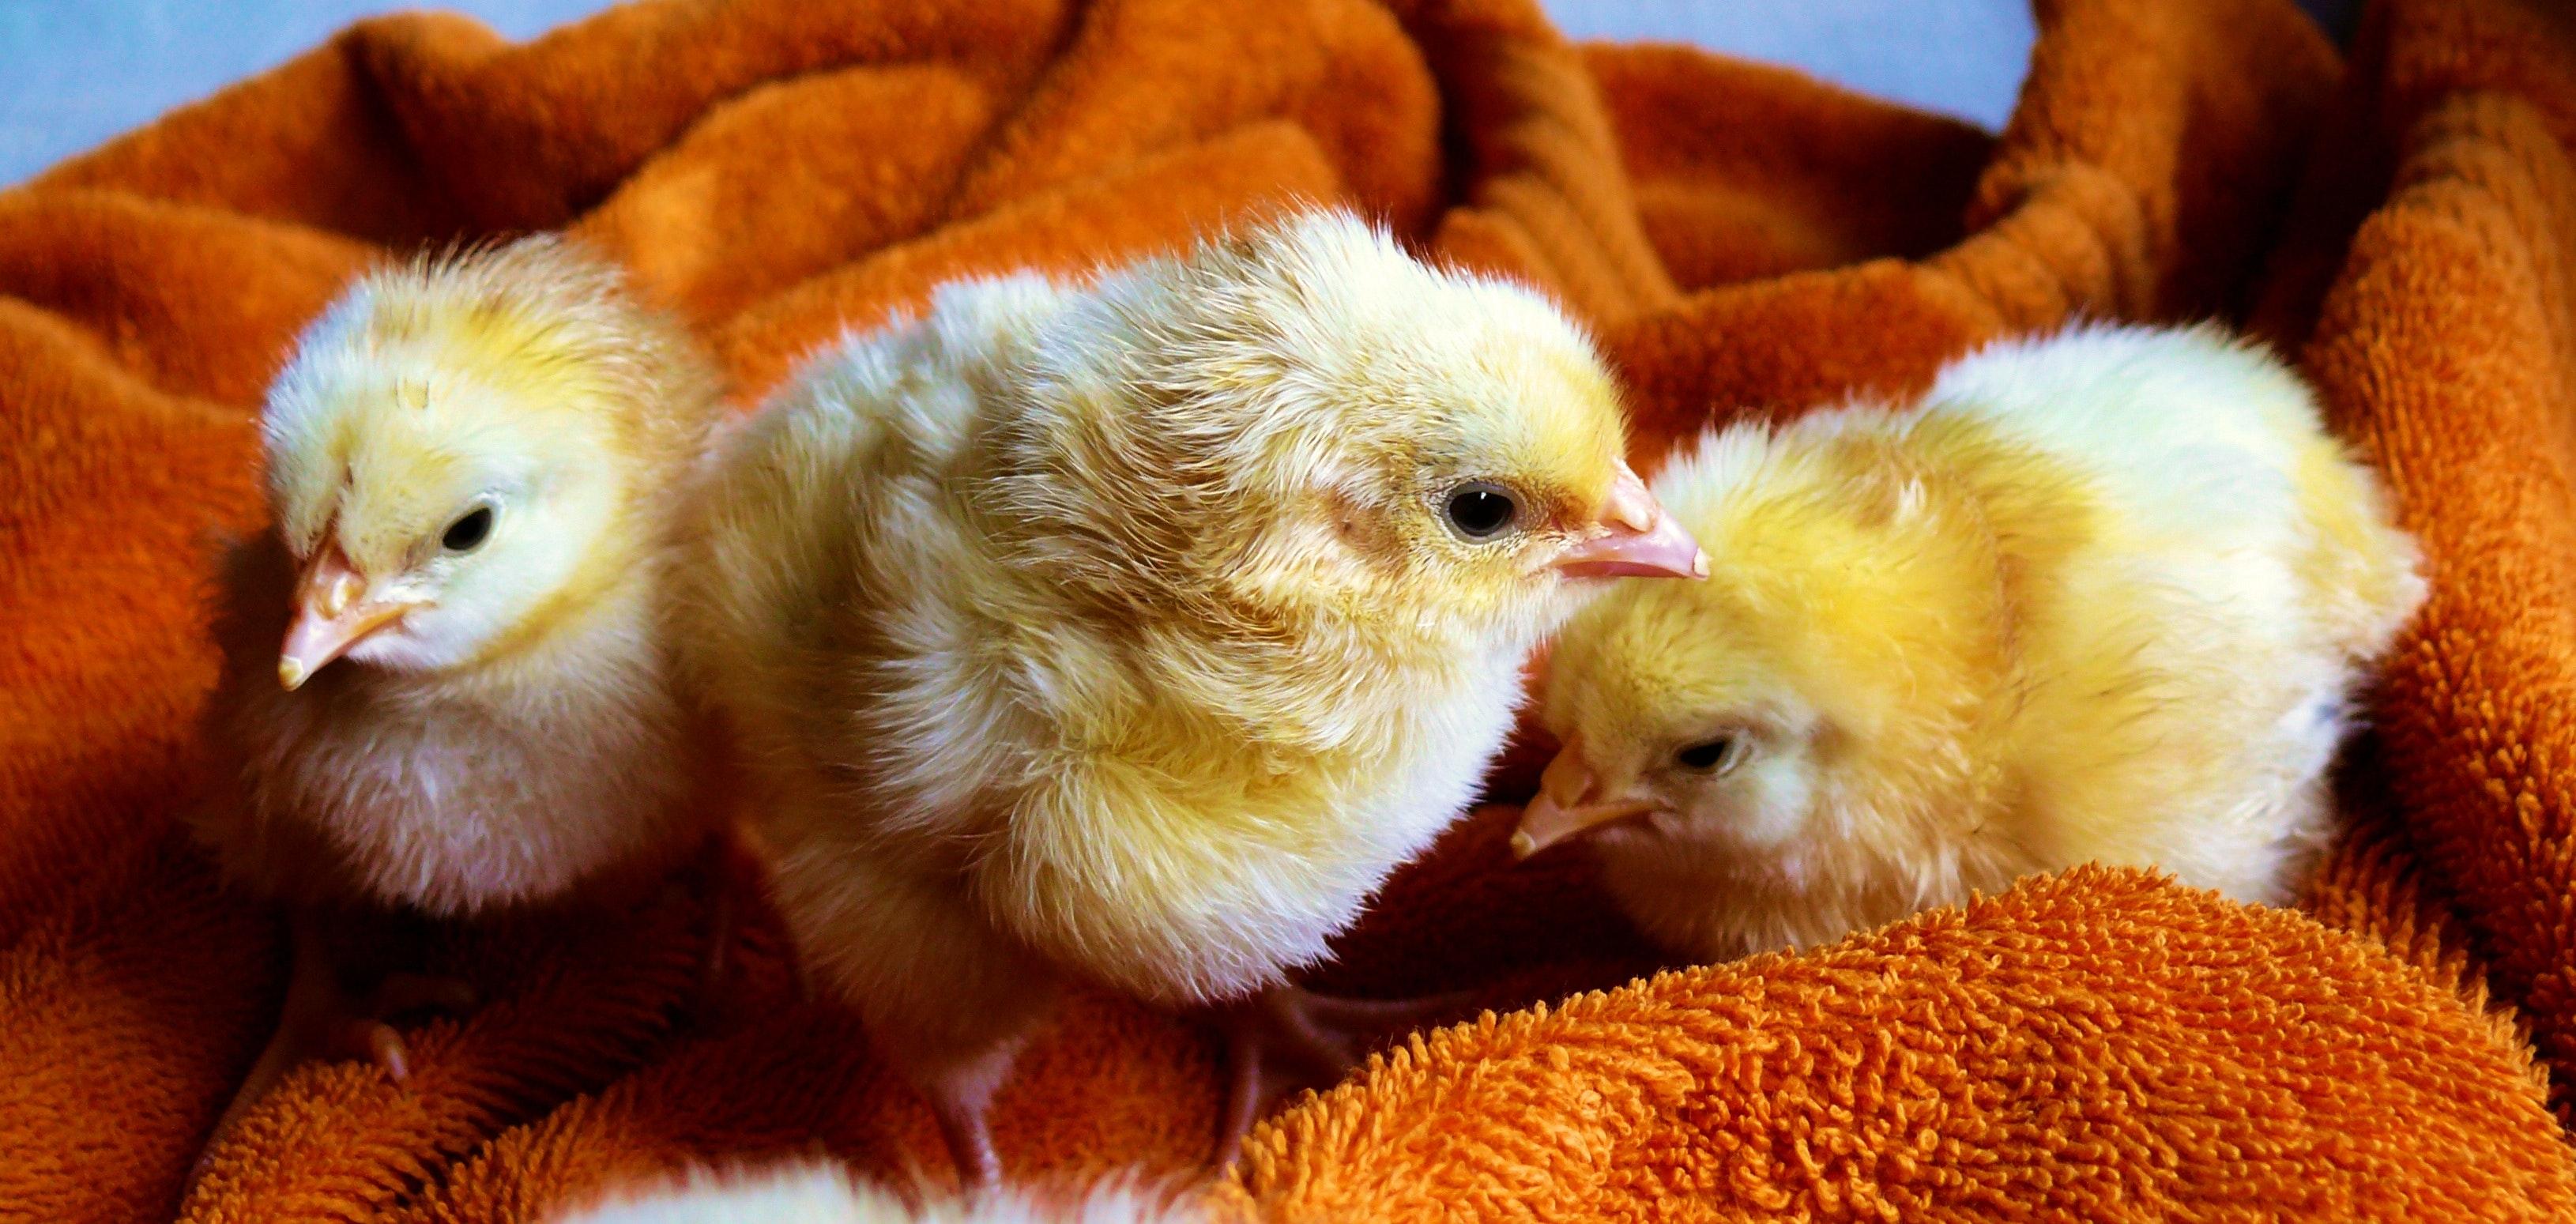 free stock photo of animals, chicken, chicks